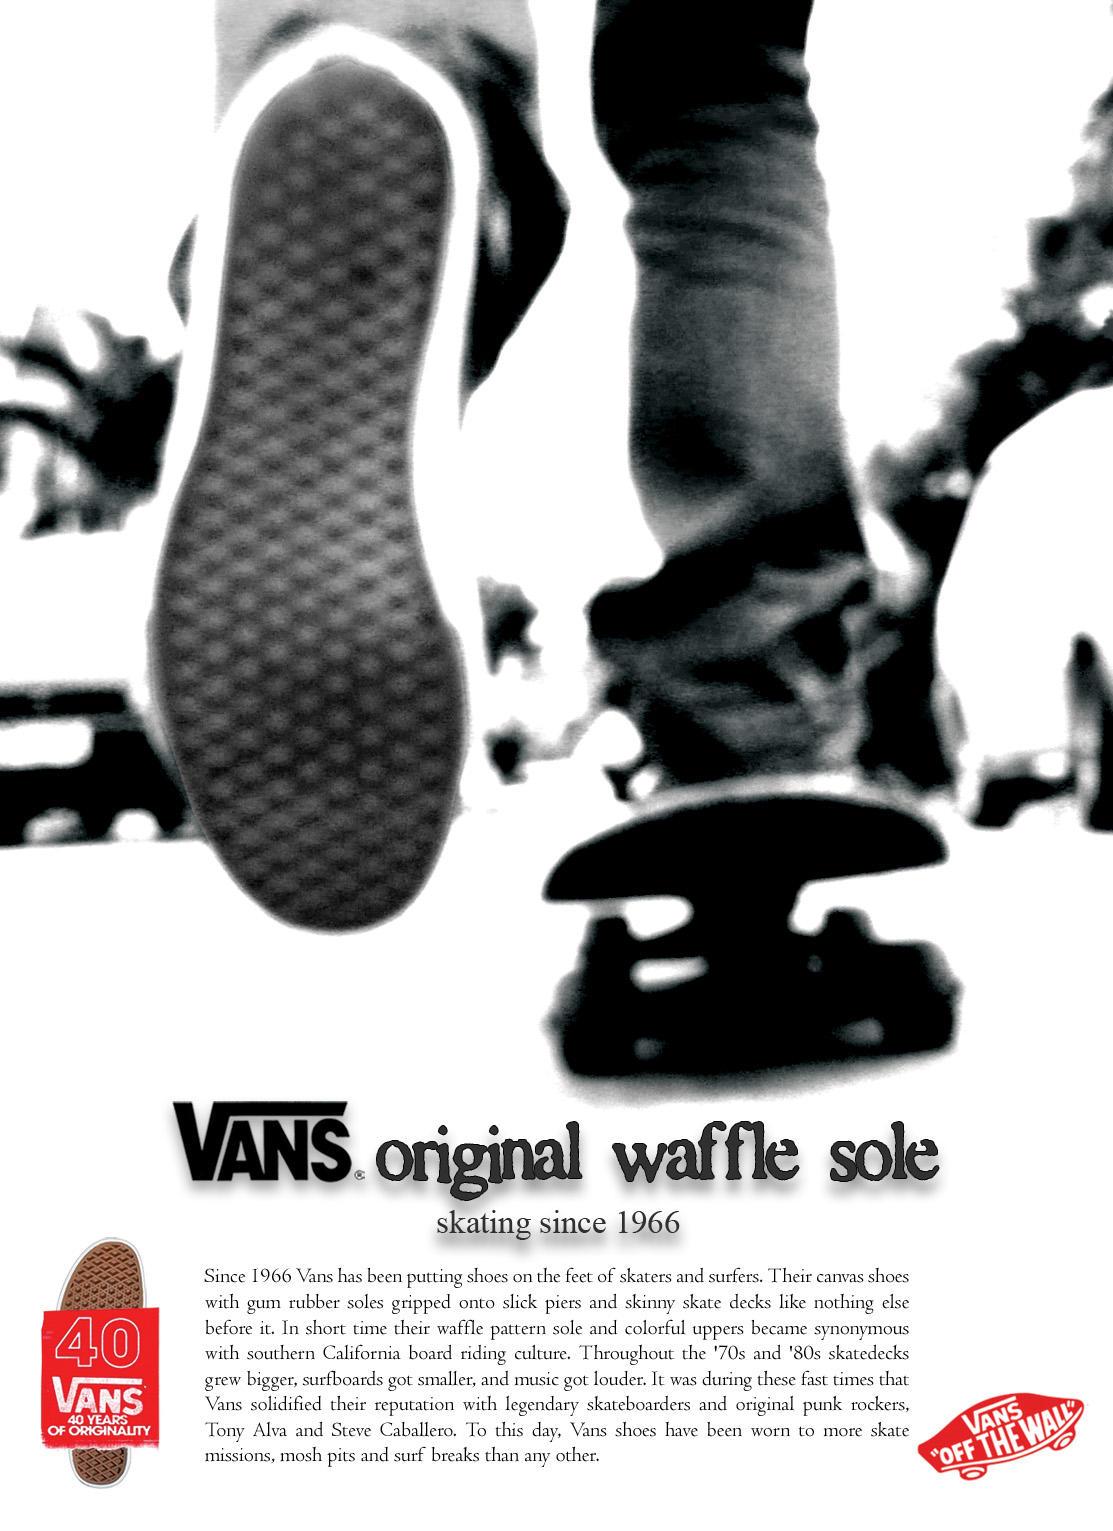 Roller shoes vans - Vans Ad By Aybandito Vans Ad By Aybandito